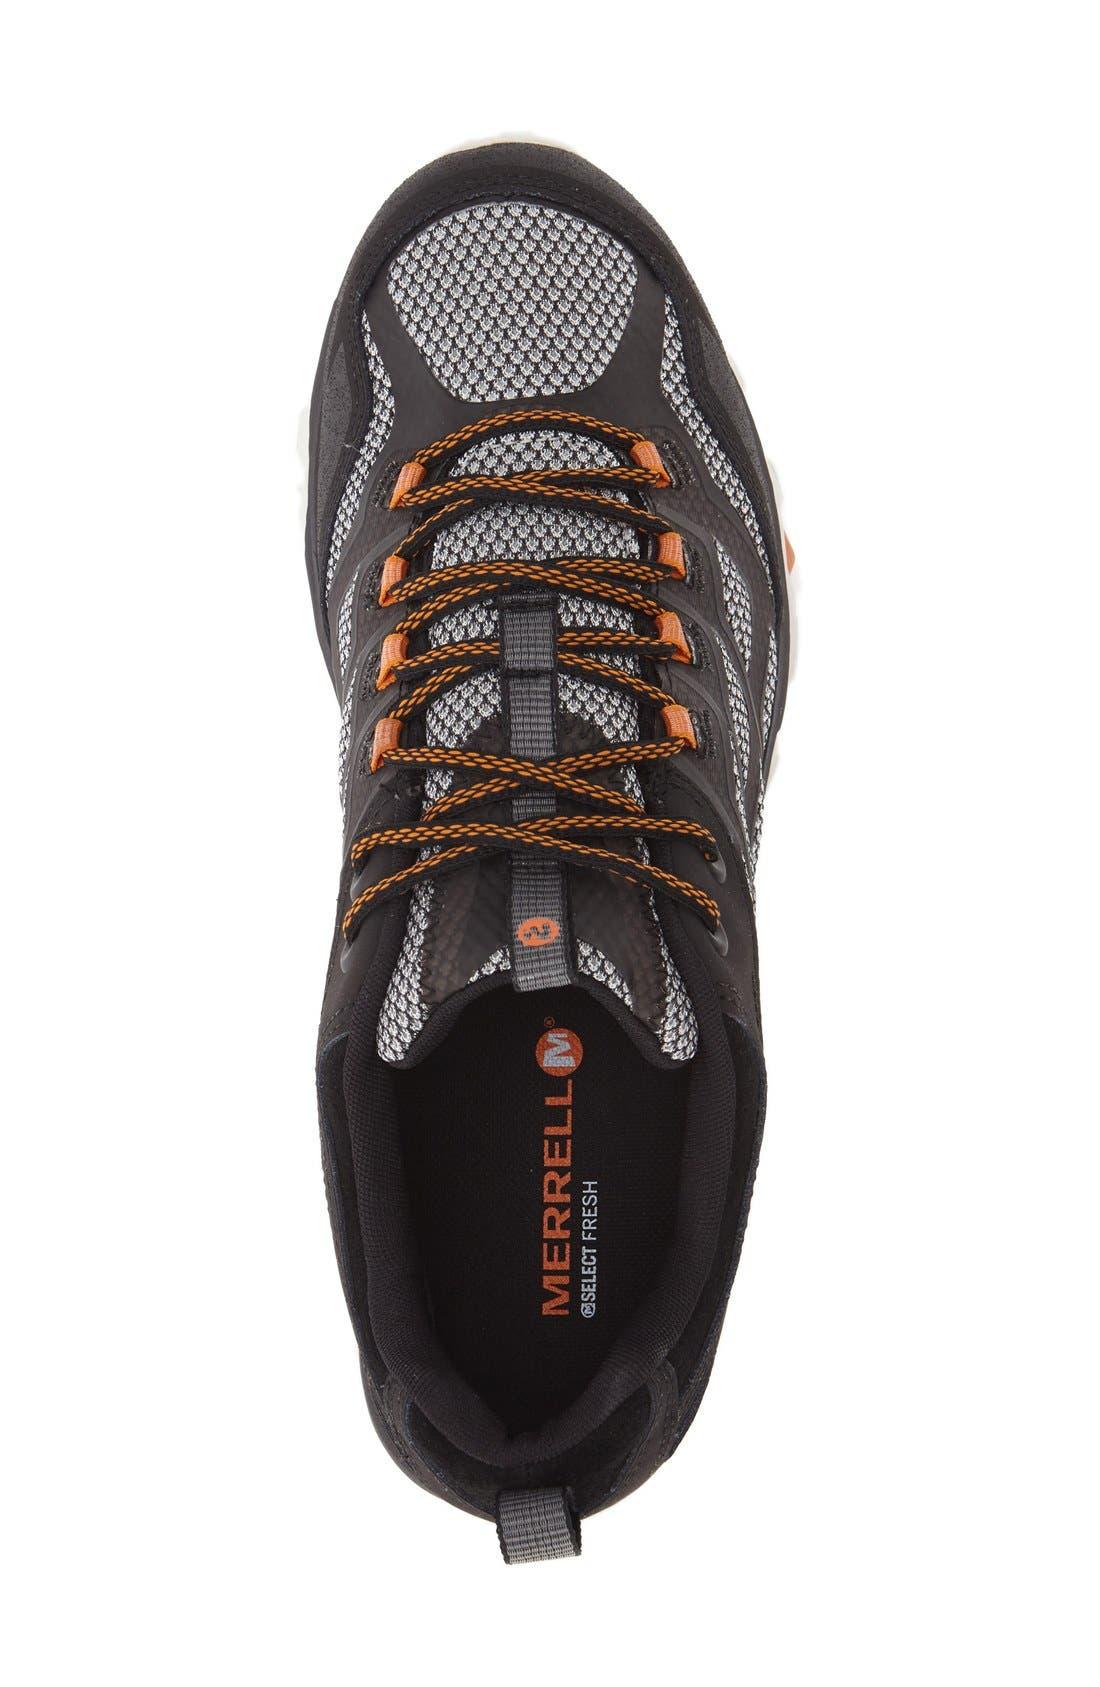 Moab FST Waterproof Hiking Shoe,                             Alternate thumbnail 3, color,                             001